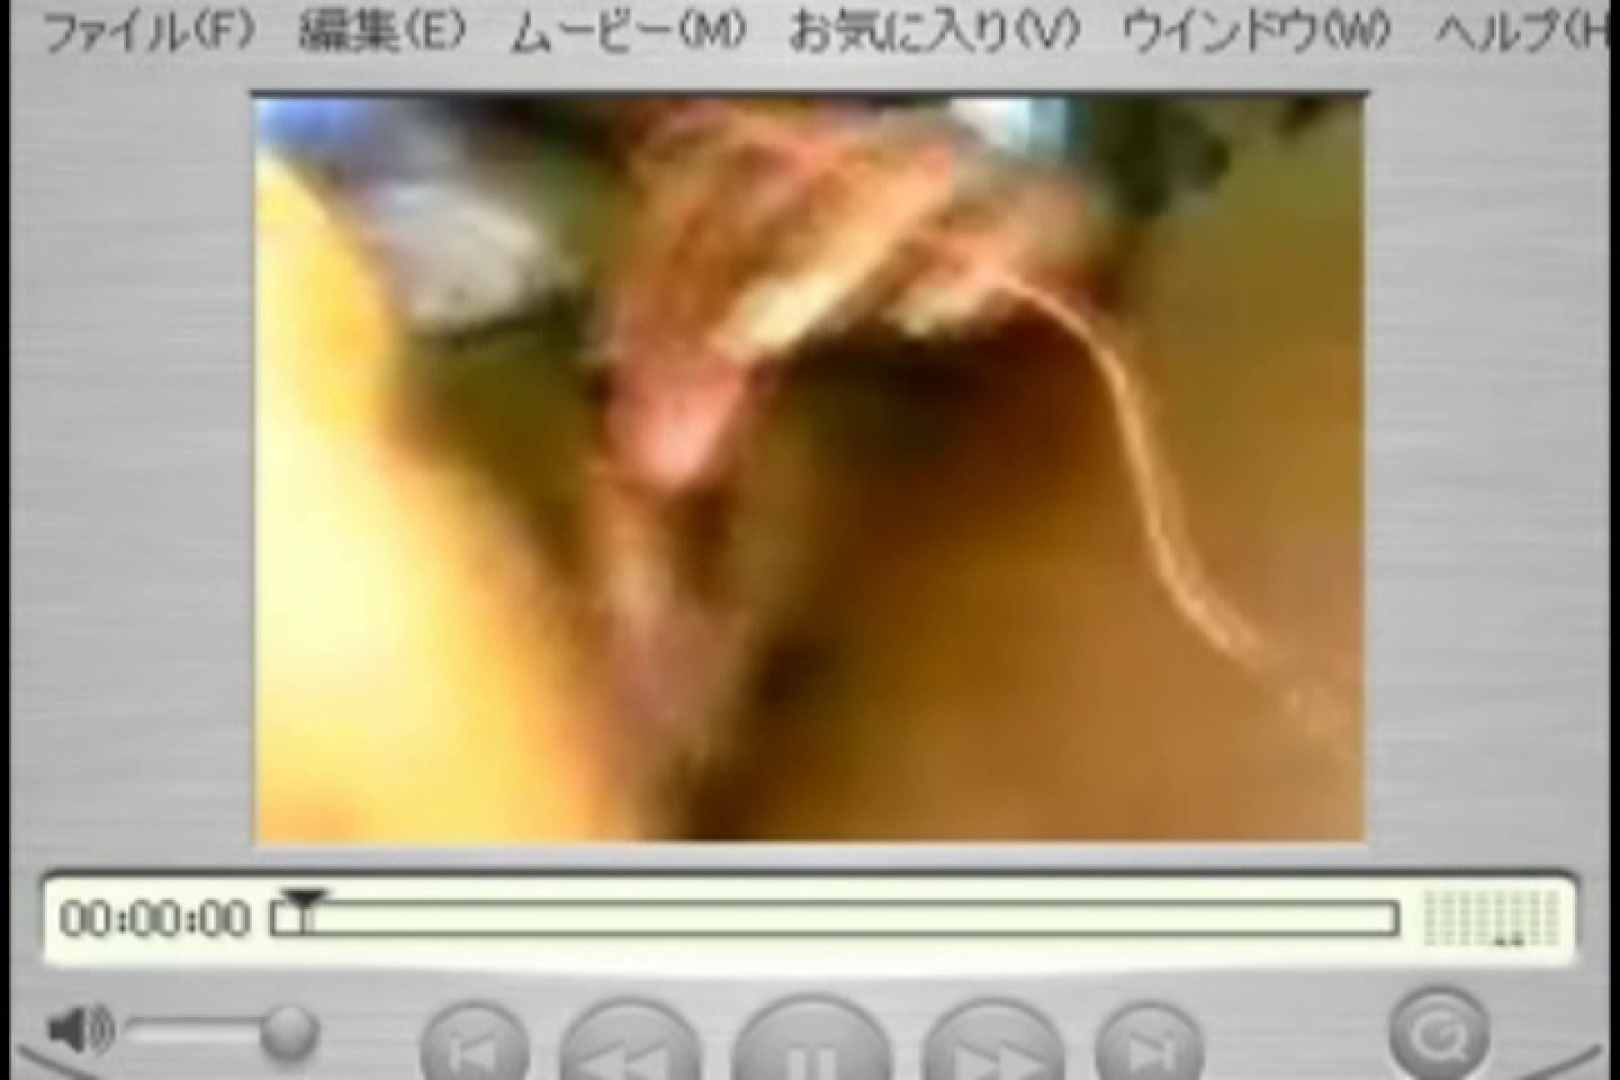 Shigeruのアルバム マンコ特別編 SEX無修正画像 73枚 28